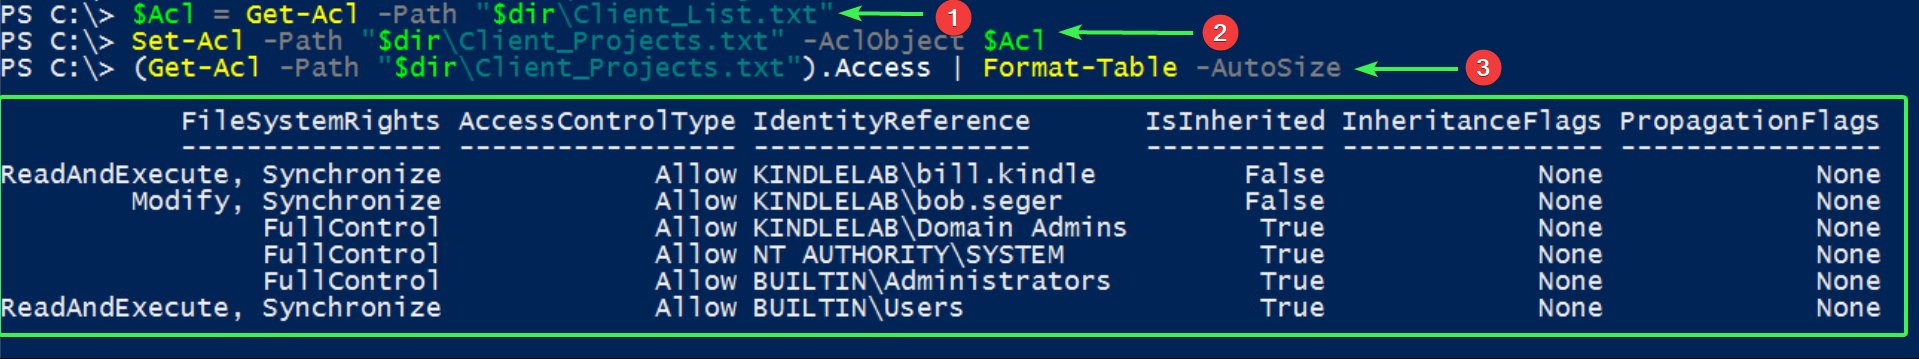 NTFS Permissions Copied